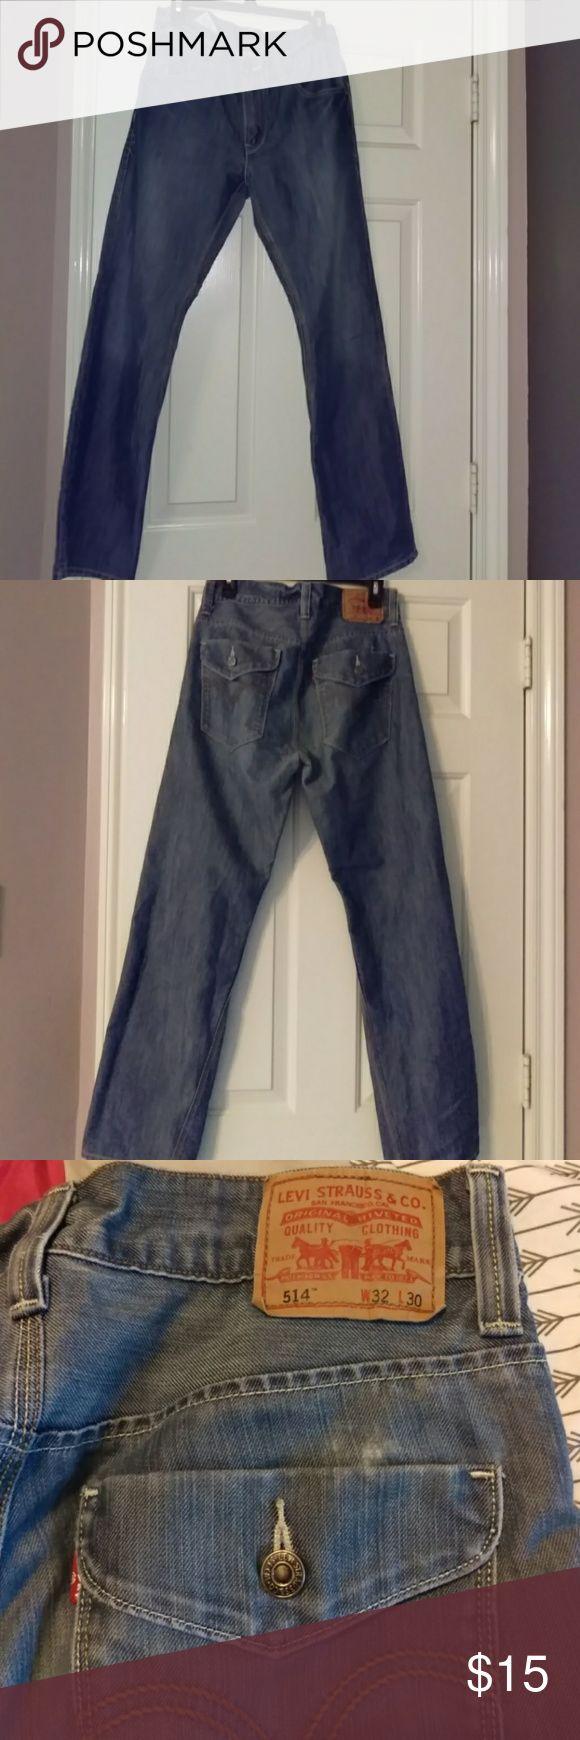 Men's Levi's 514 32/30 Blue Jeans Men's Levi's 514 32/30 Blue Jeans Levi's Jeans Straight